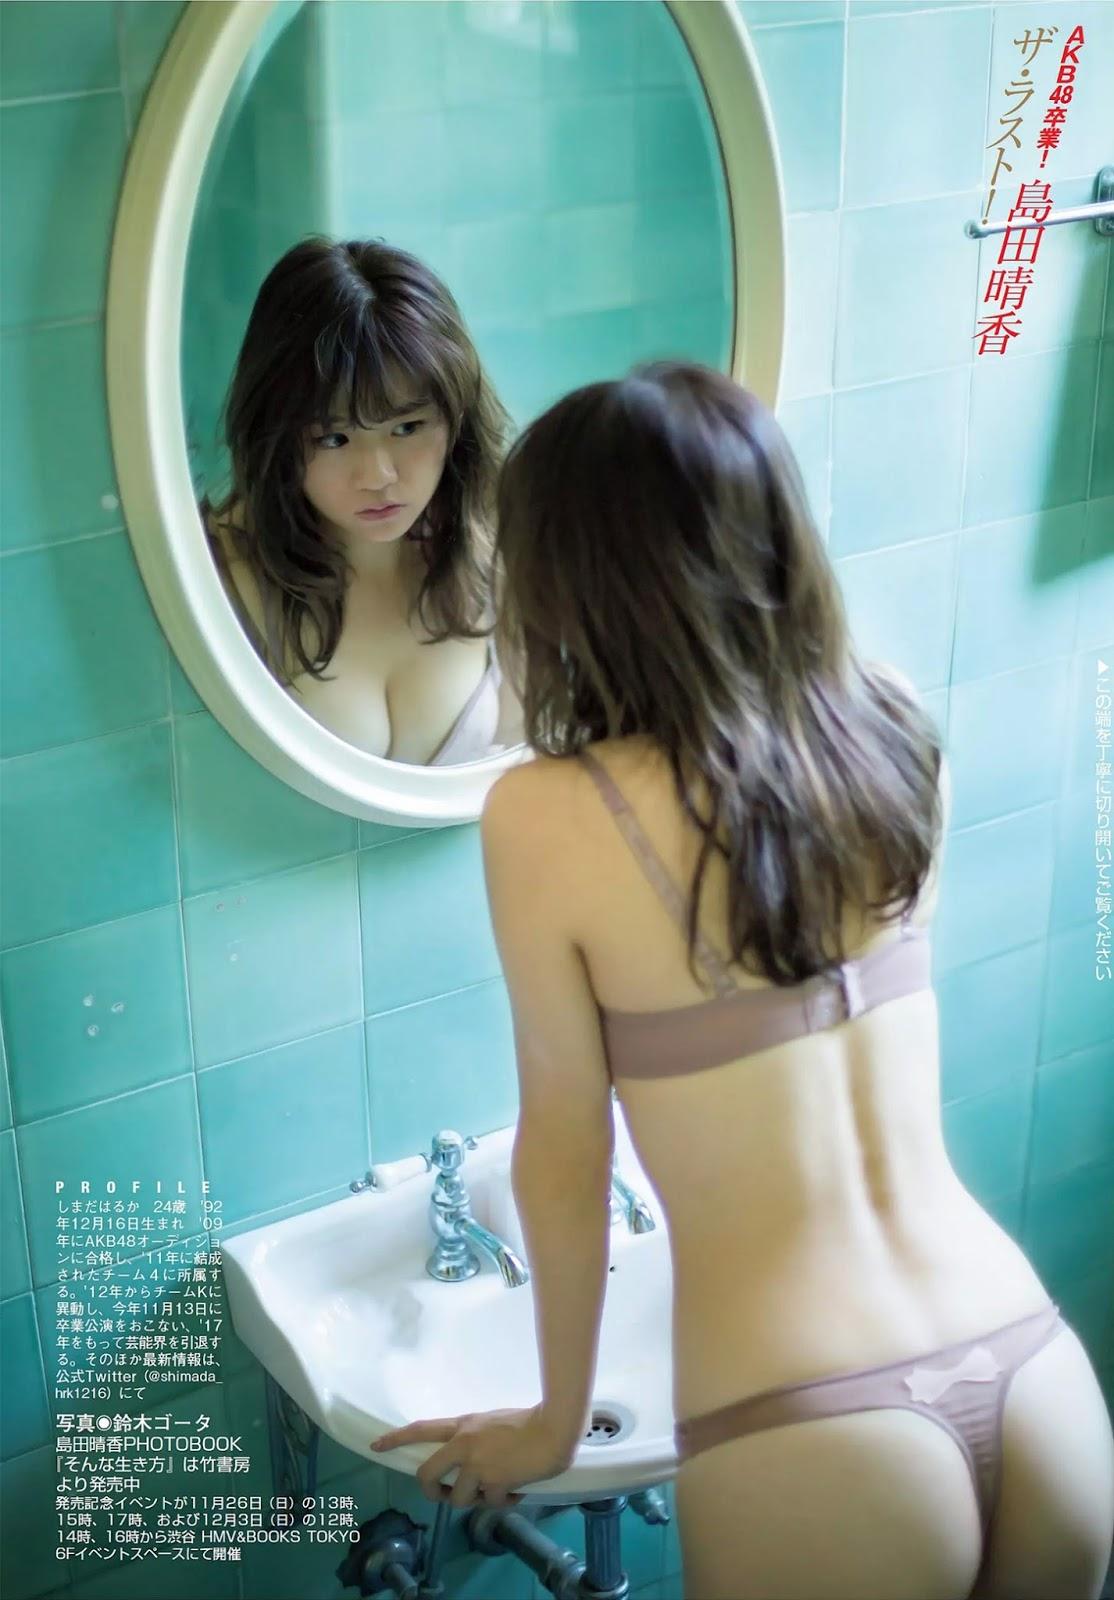 Shimada Haruka 島田晴香, FLASH 電子版 2017.12.05 (フラッシュ 2017年12月05日号)